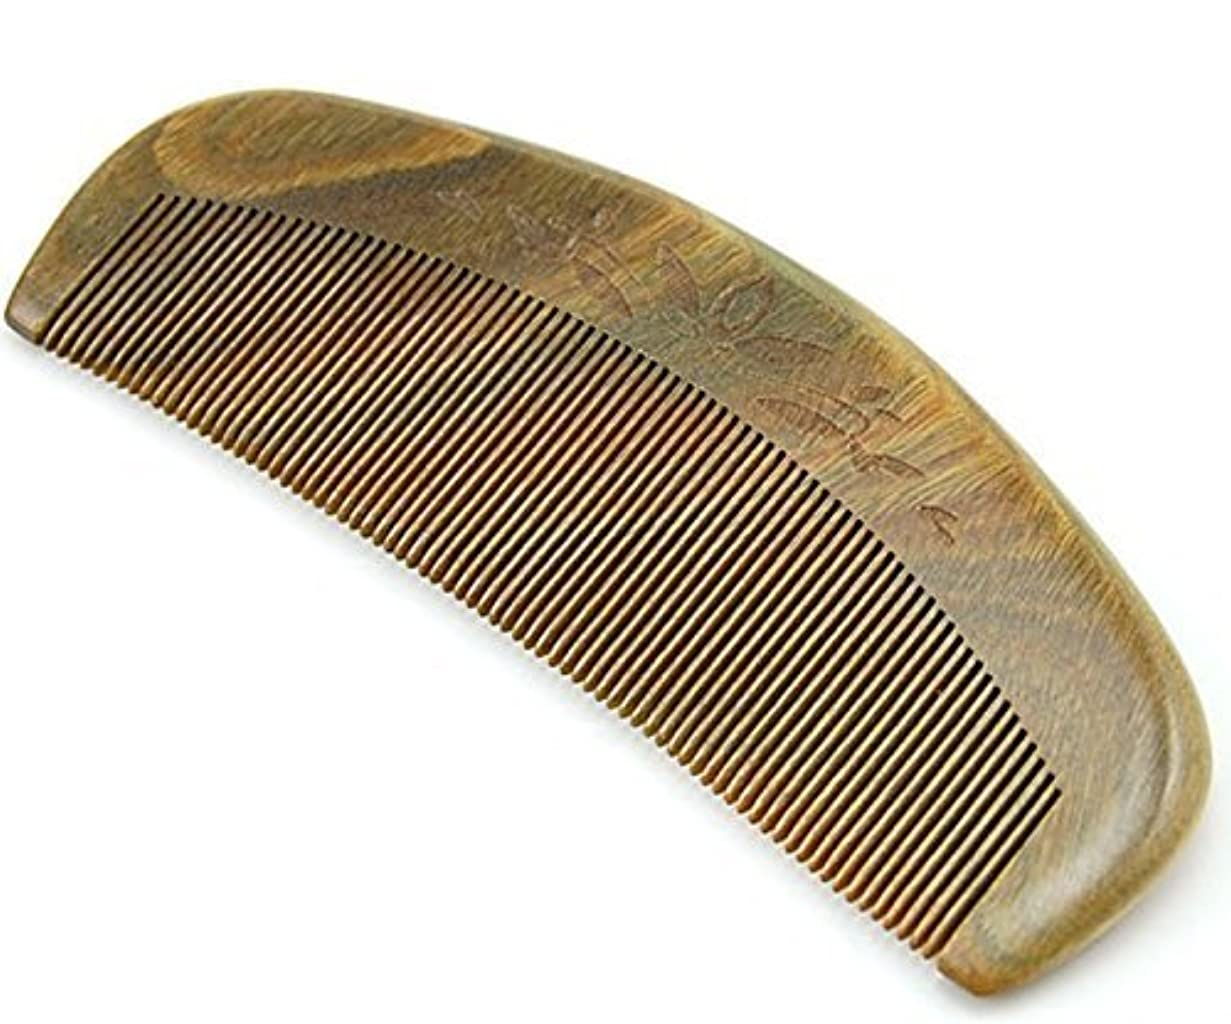 Joyo Natural Green Sandalwood Fine Tooth Comb, Anti Static Pocket Wooden Comb 5